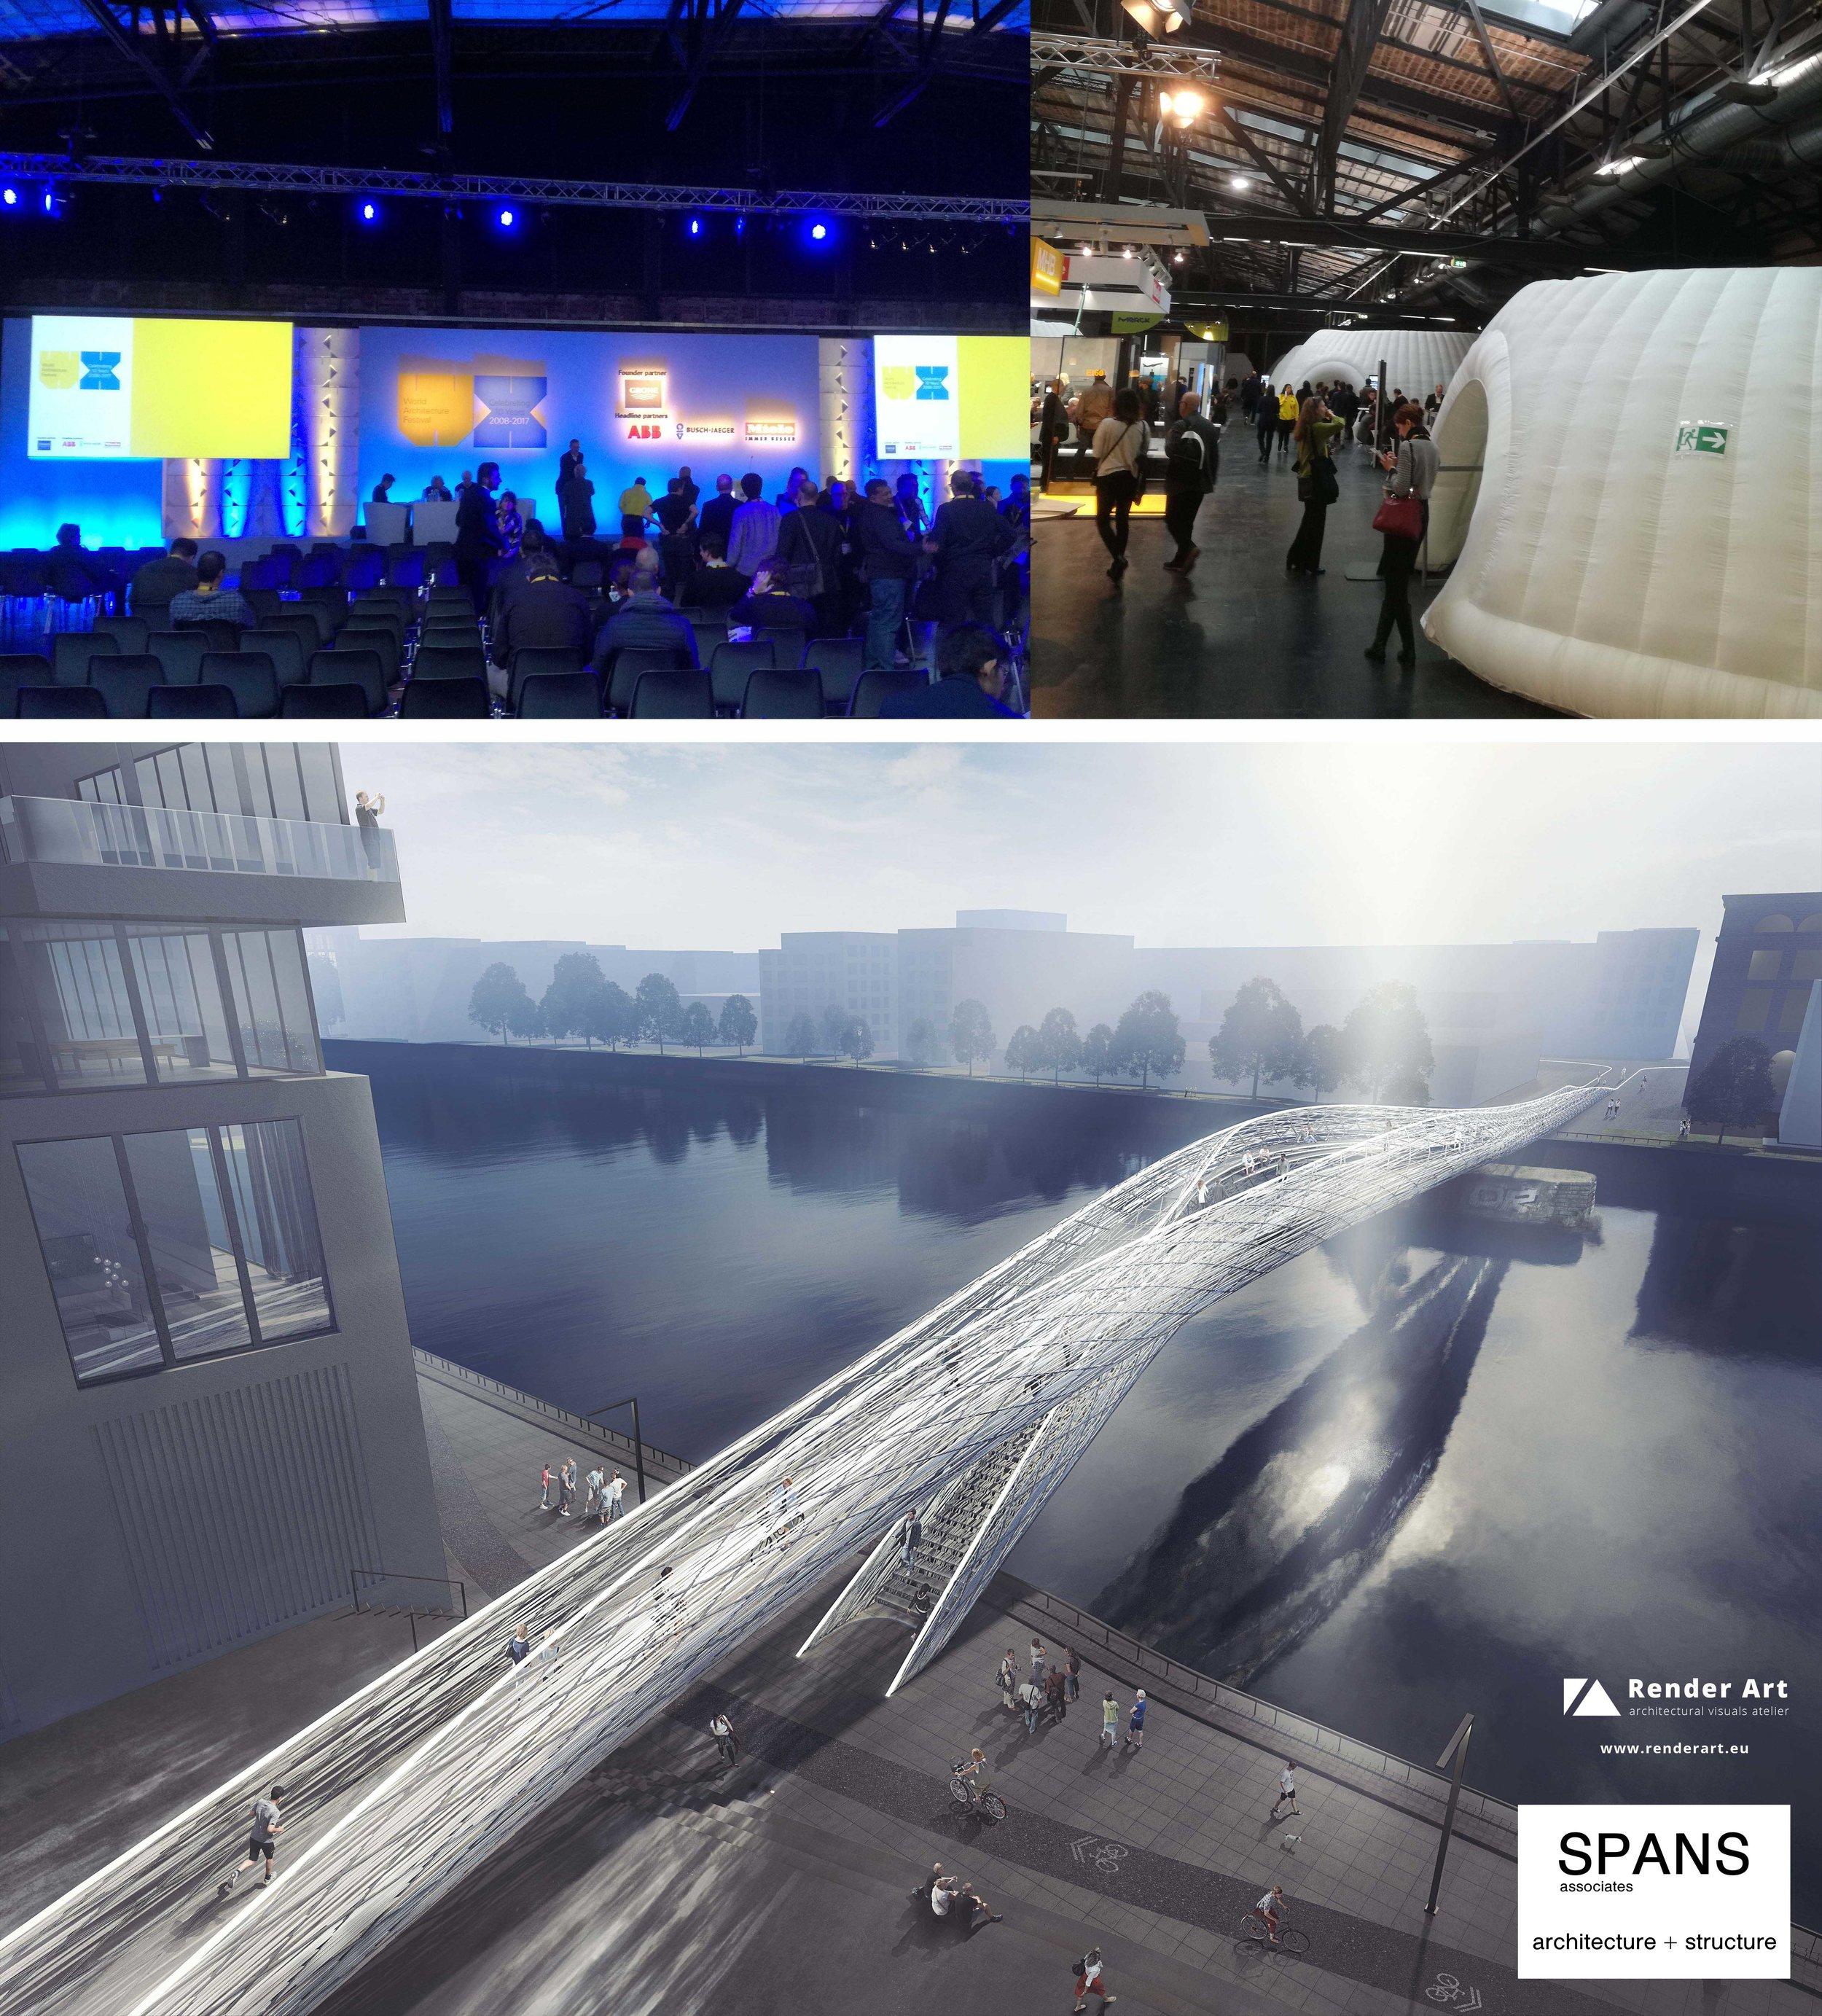 Render Art , rendering  #SPANSassociates #theflowingbridge  #waf   #worldarchitecturefestival   #renderart   #vision  #architecturestorytelling  #impressions